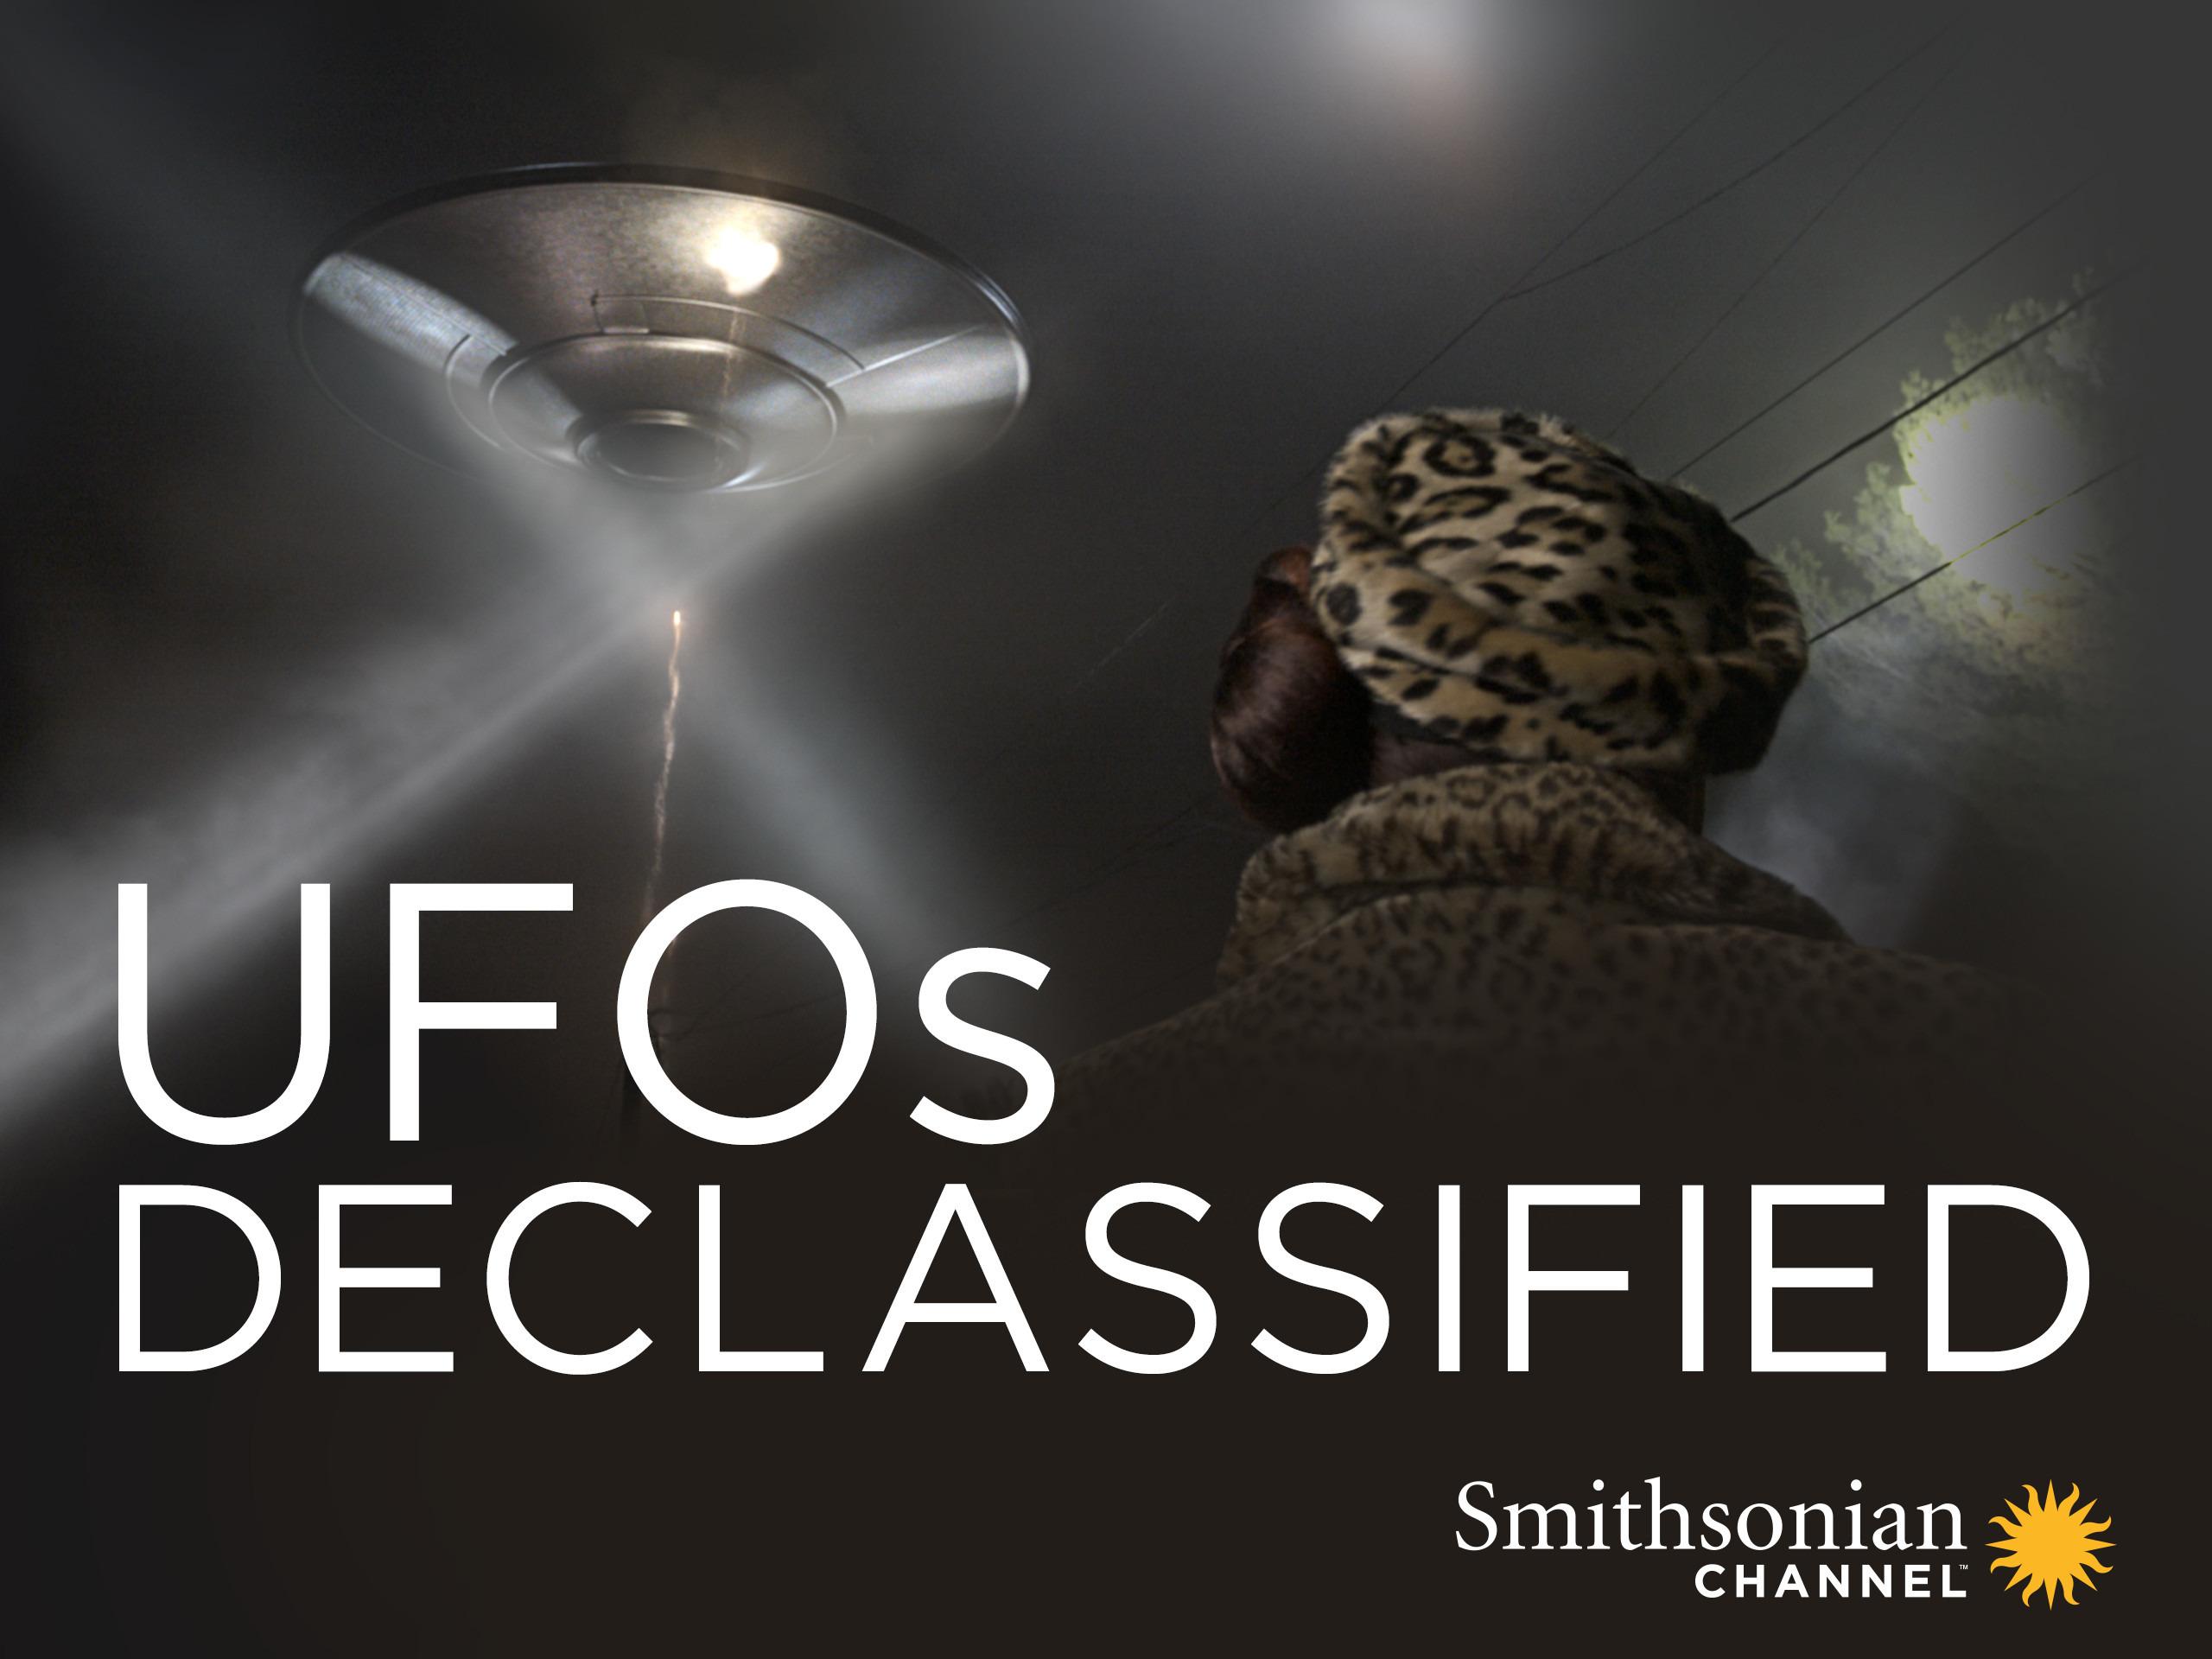 Watch UFOs Declassified Season 1 Episode 6: UFOs vs